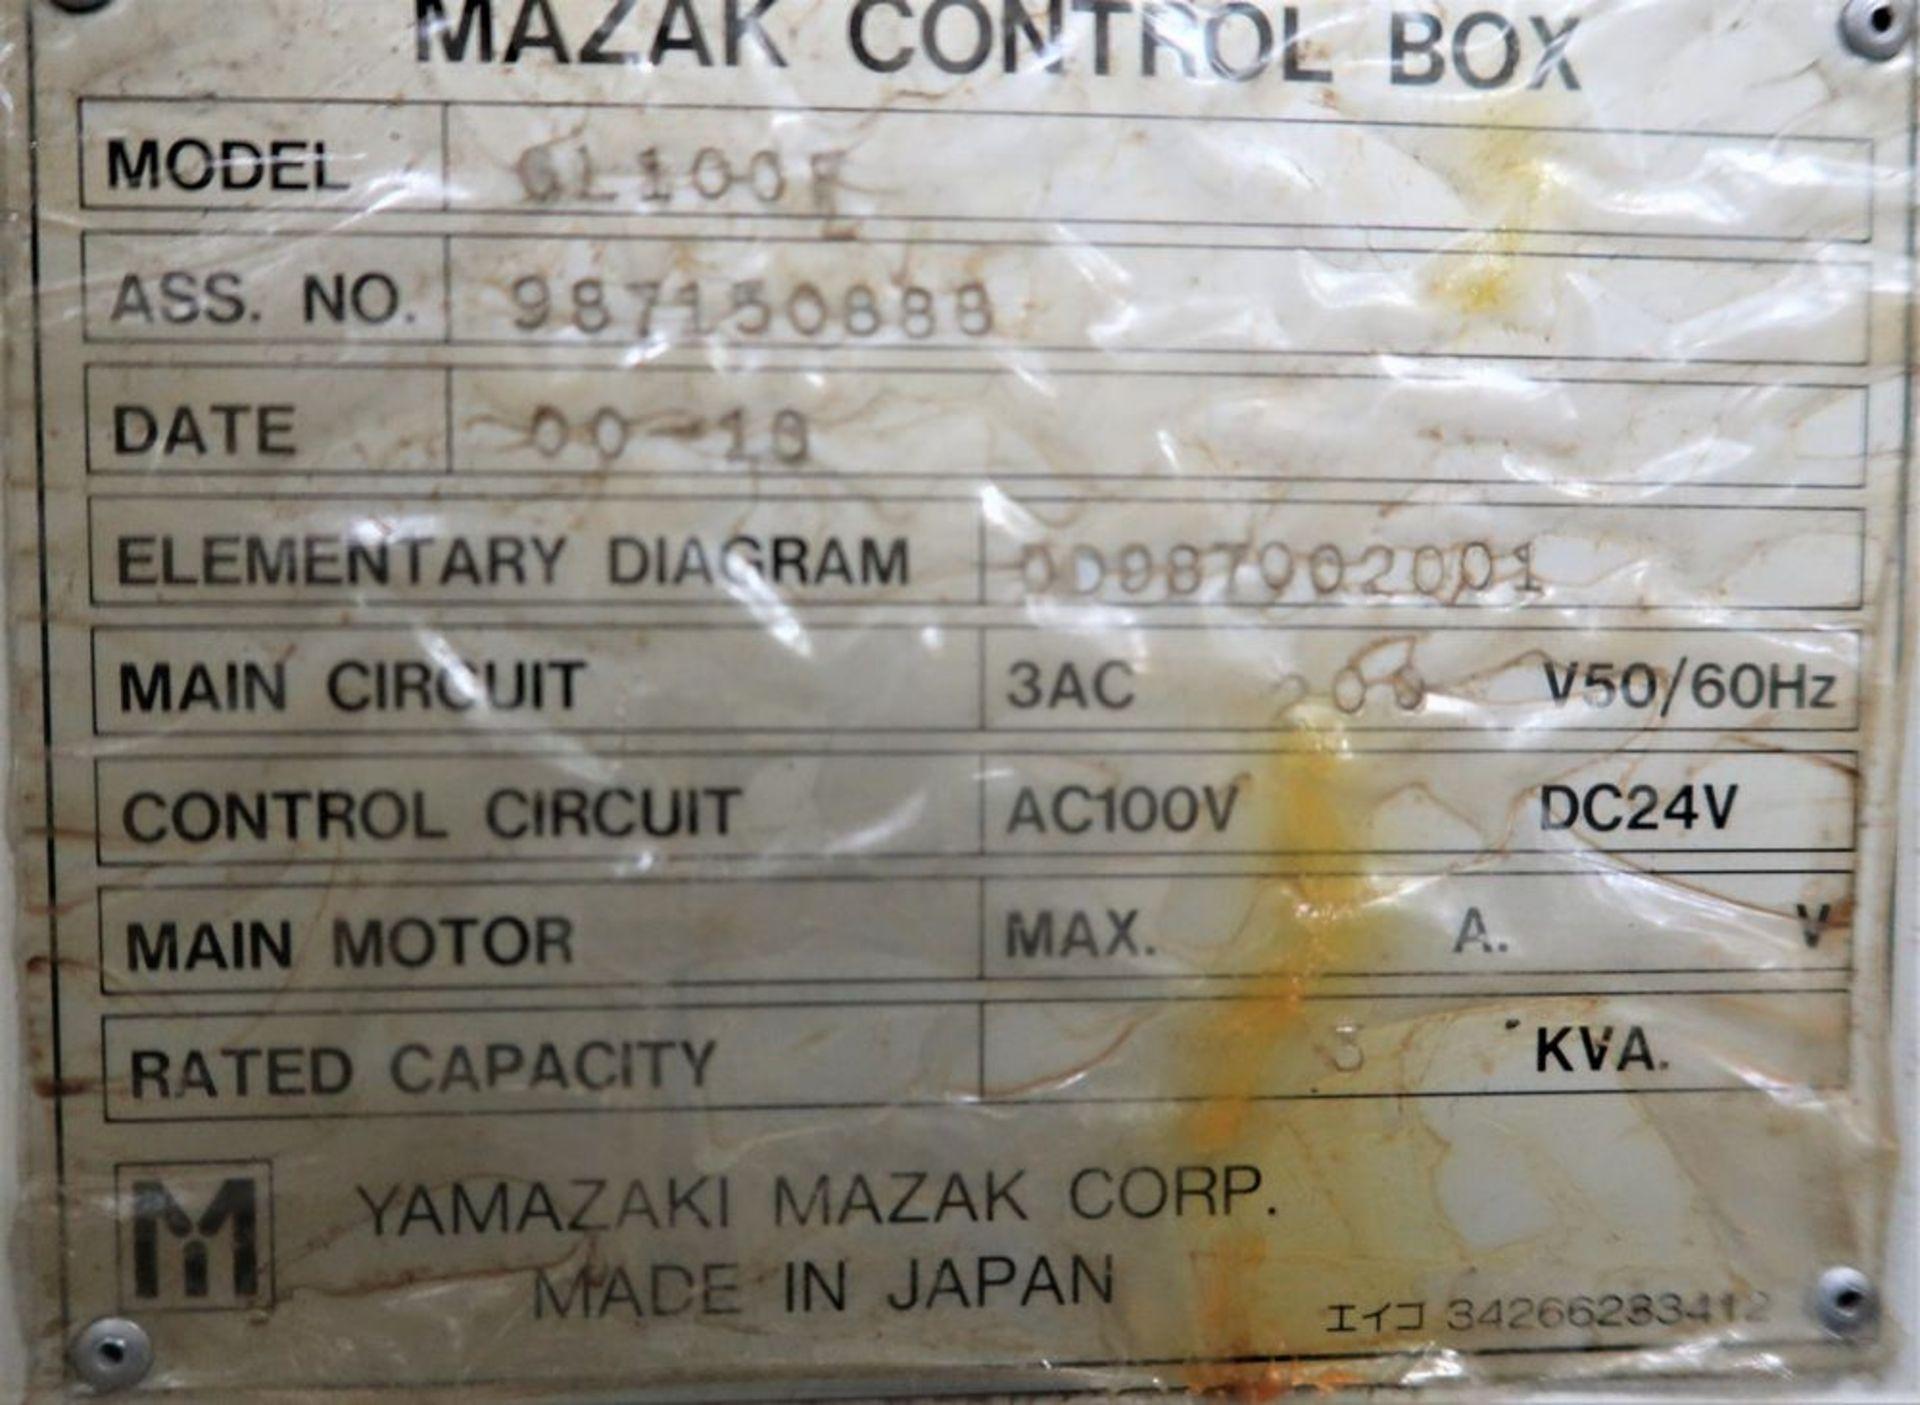 Mazak Dual Turn 25 Twin Spindle CNC Turning Center lathe, S/N 150888 - Image 12 of 13